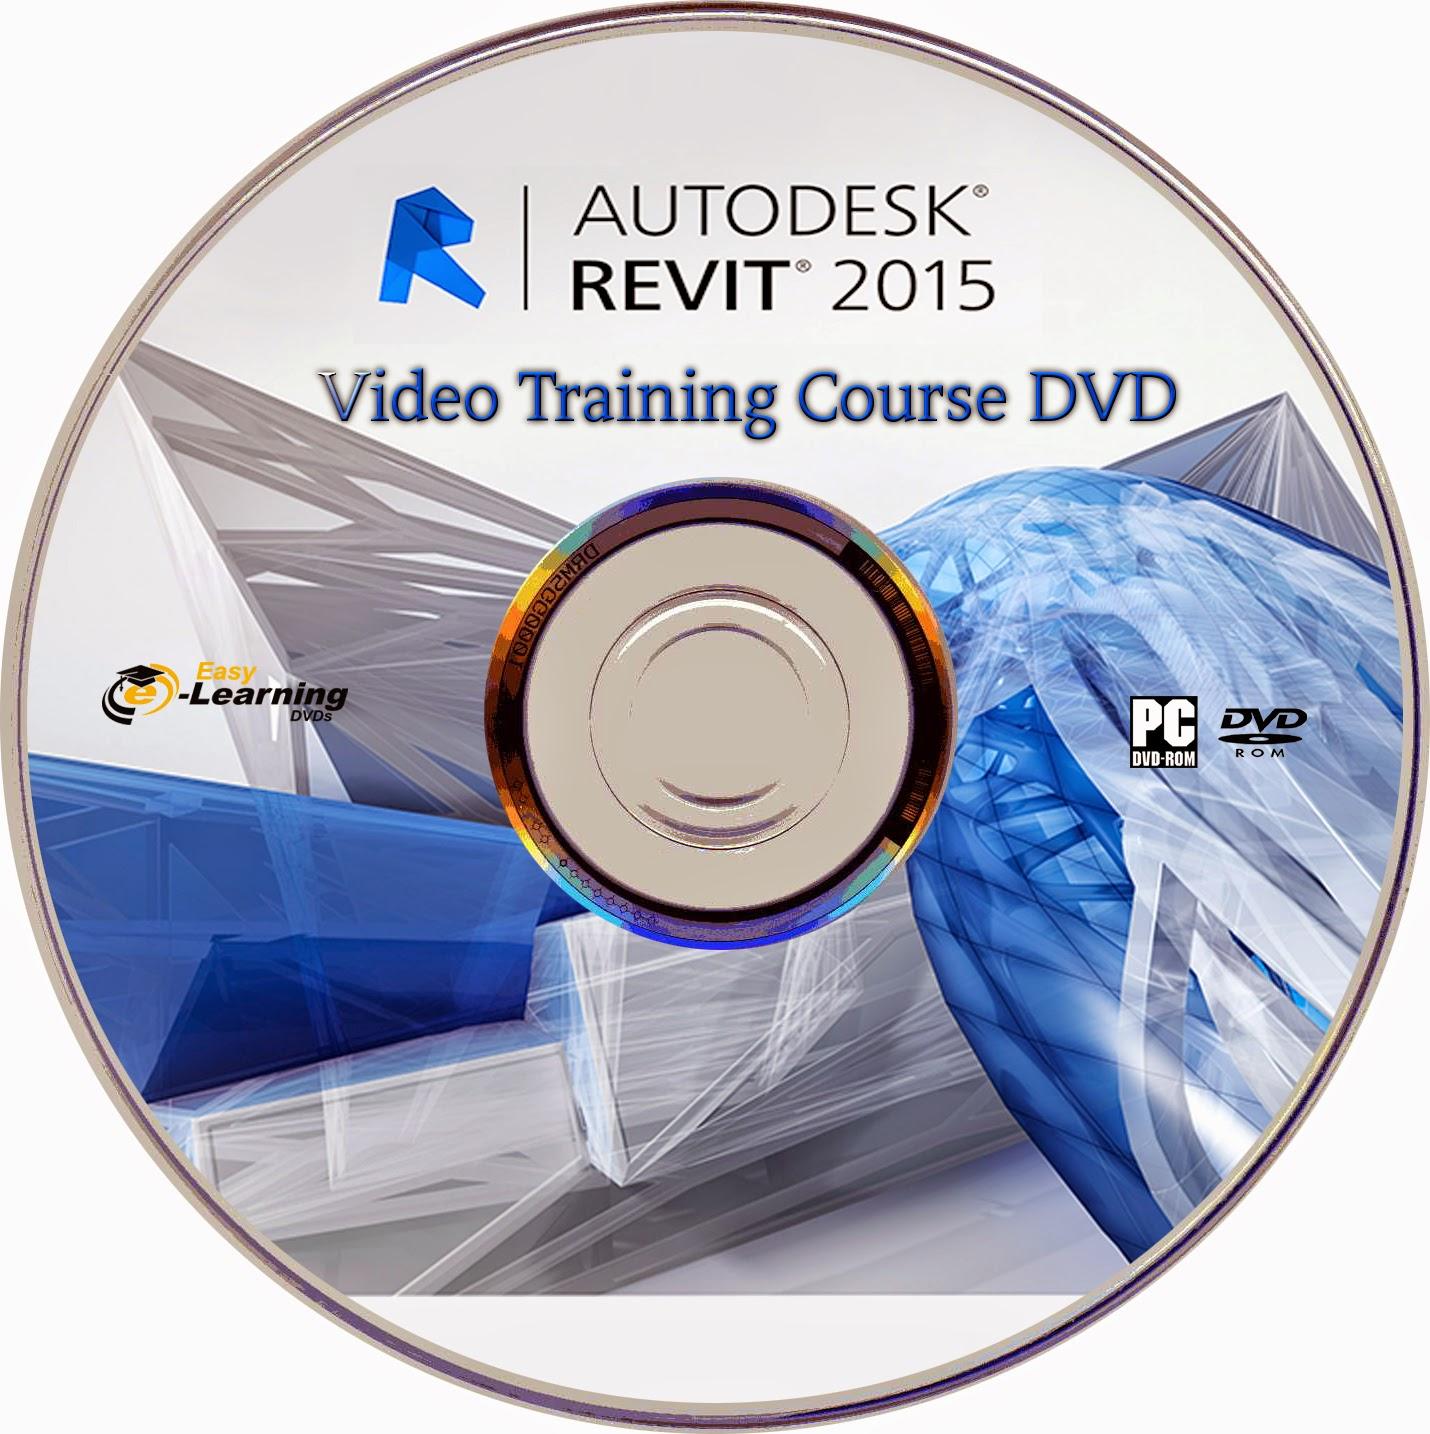 كورس ريفيت 2015 كامل Structure REVIT 2015 course يوتيوب + لينكات مباشره لتحميل الكورس